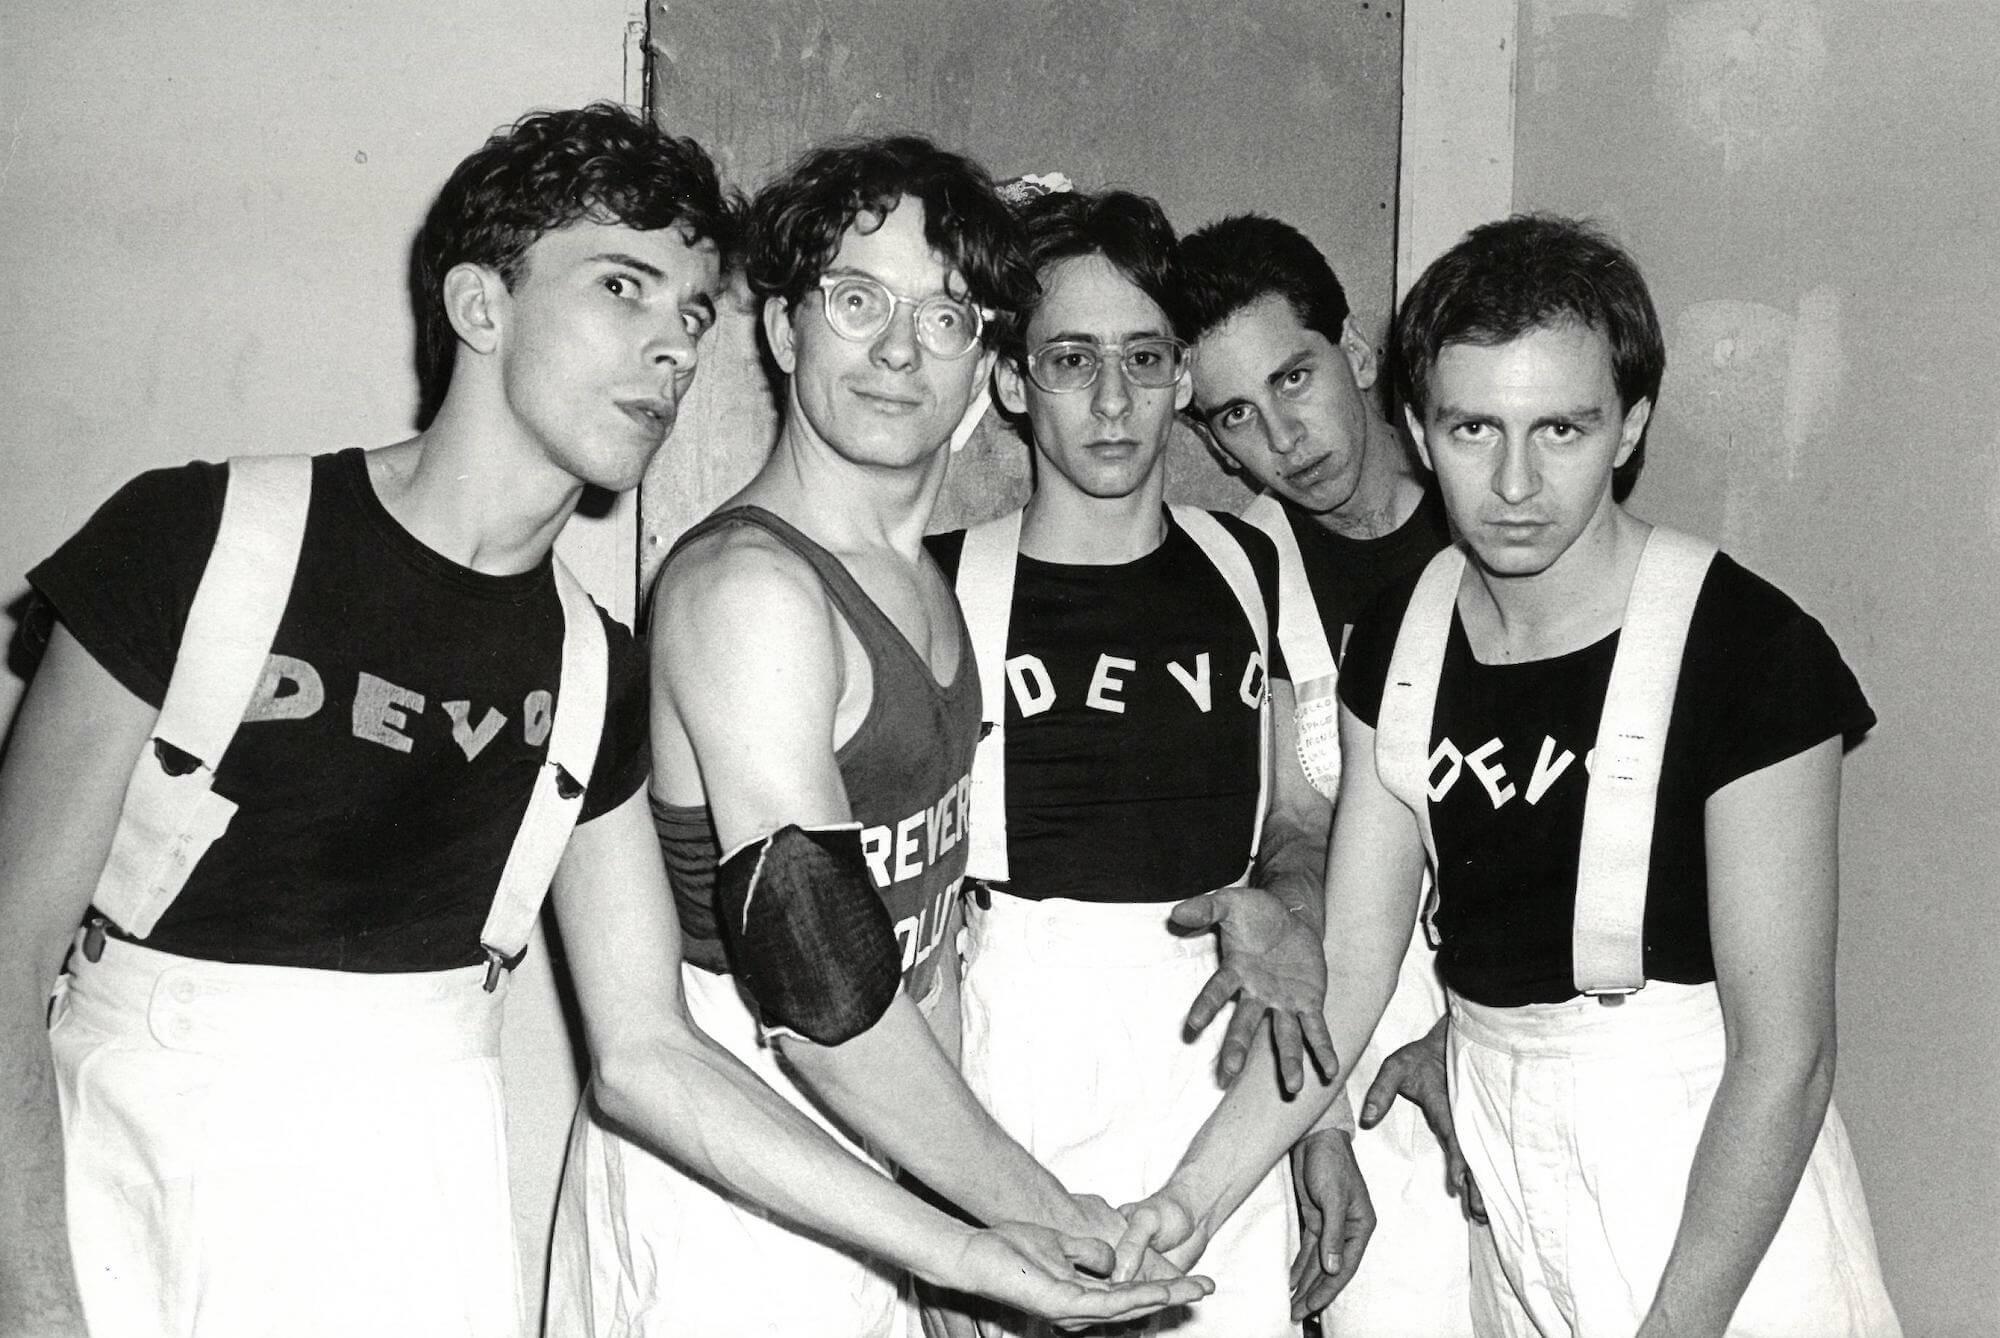 Devo at Max's Kansas City, 1977